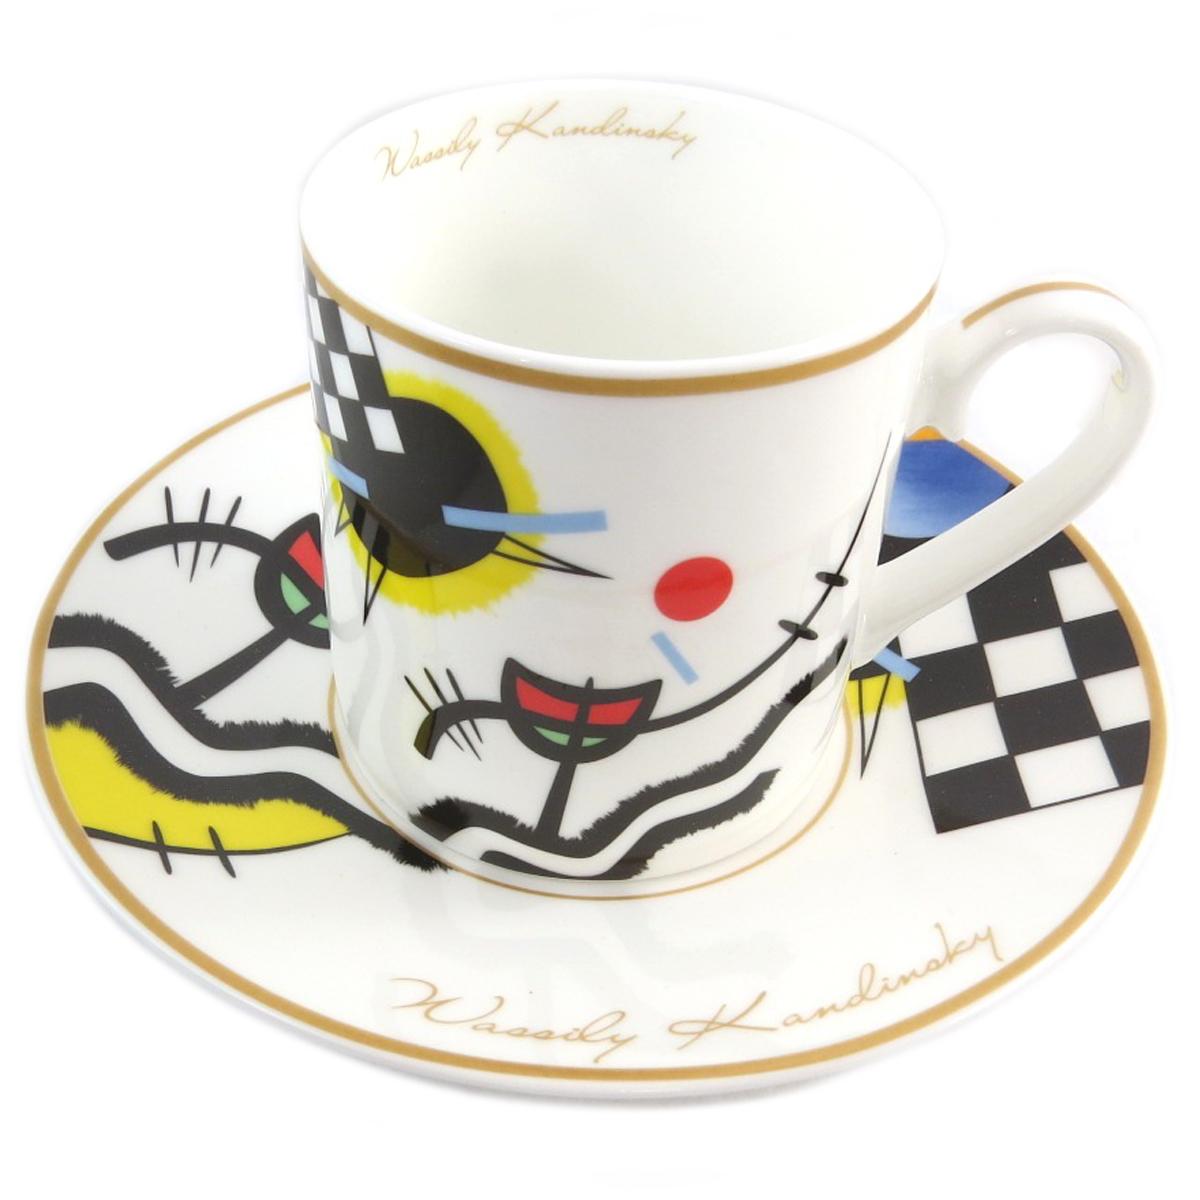 Coffret tasse porcelaine \'Wassily Kandinsky\' - 25 cl - [Q0237]